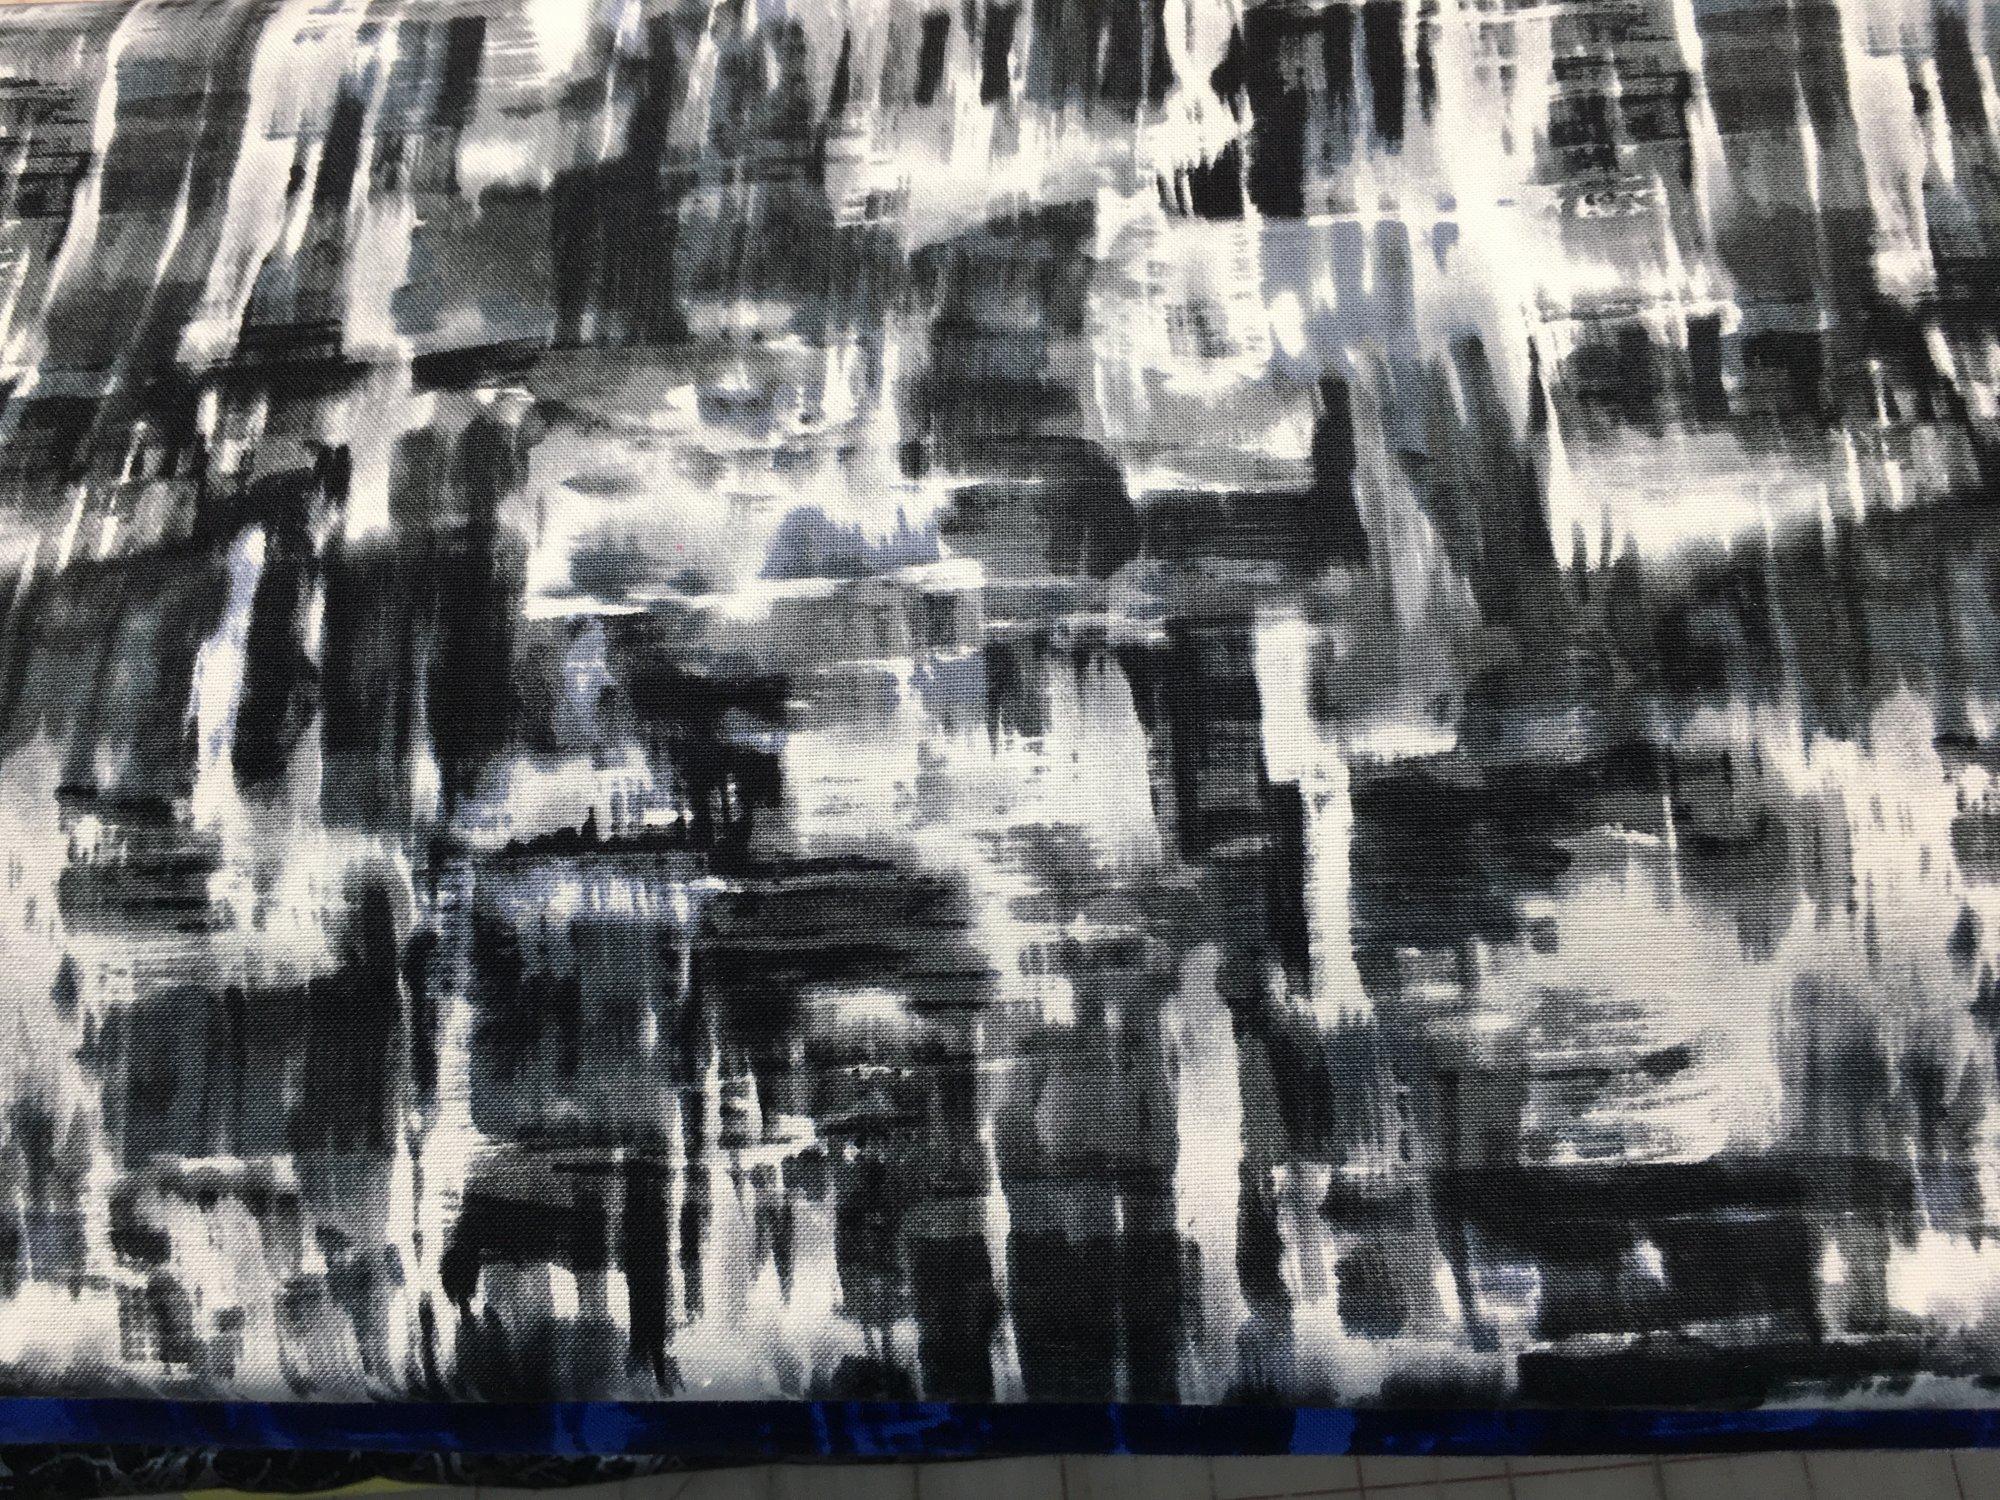 SE-Prismachrome 5238-90 Black/White